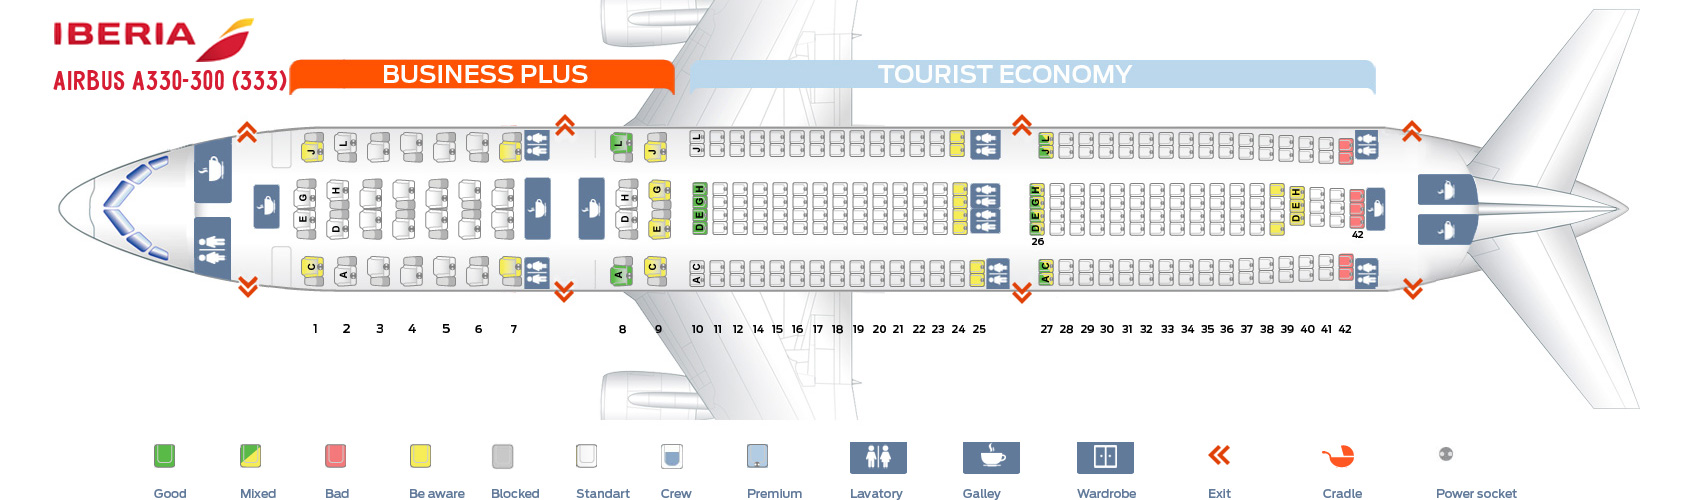 Seat Map Airbus A330-300 Iberia